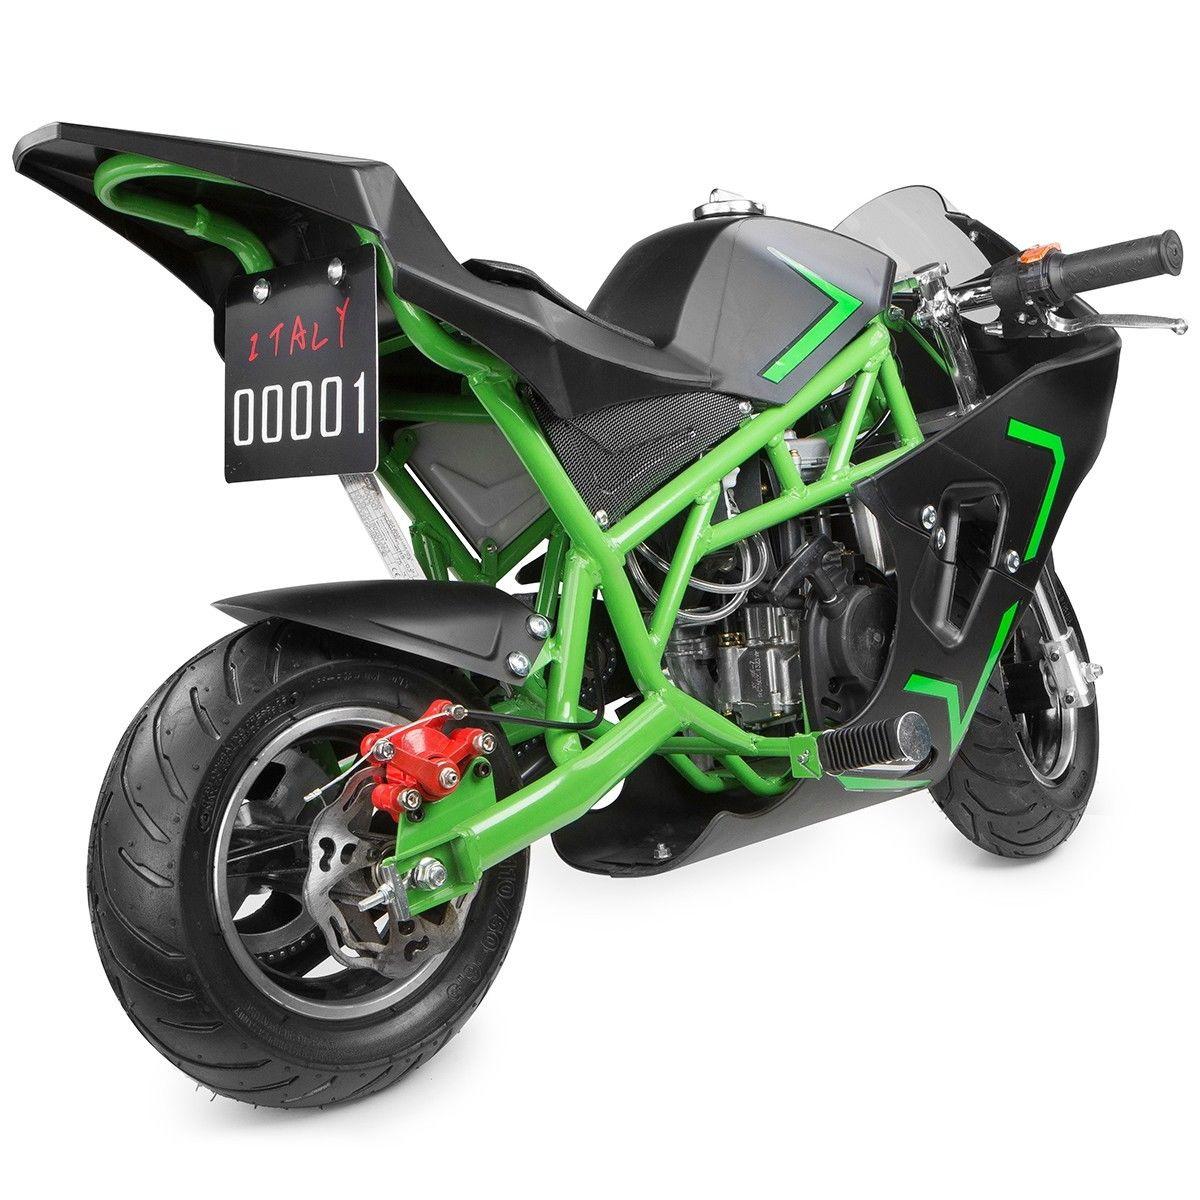 XtremepowerUS-Gas-Pocket-Bike-Motor-Bike-Scooter-40cc-Epa-Engine-Motorcycle thumbnail 14